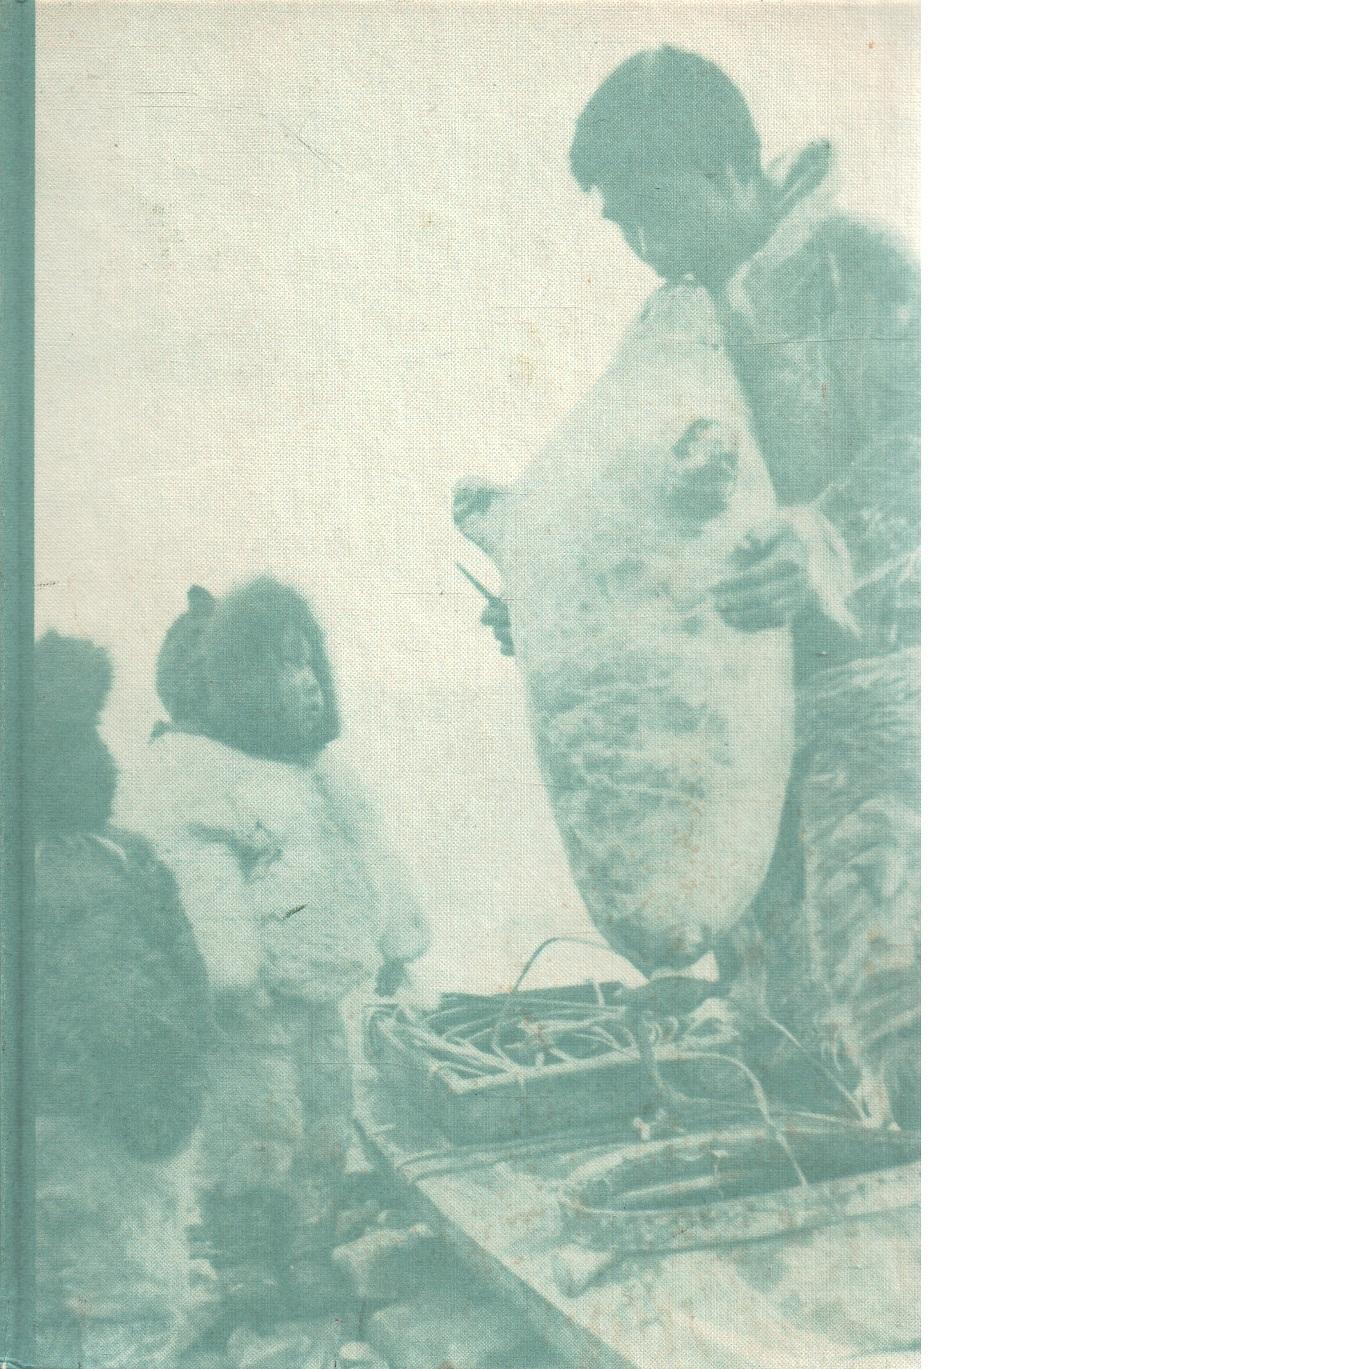 Inok : en Grönlandsbok - Norrman, Lars